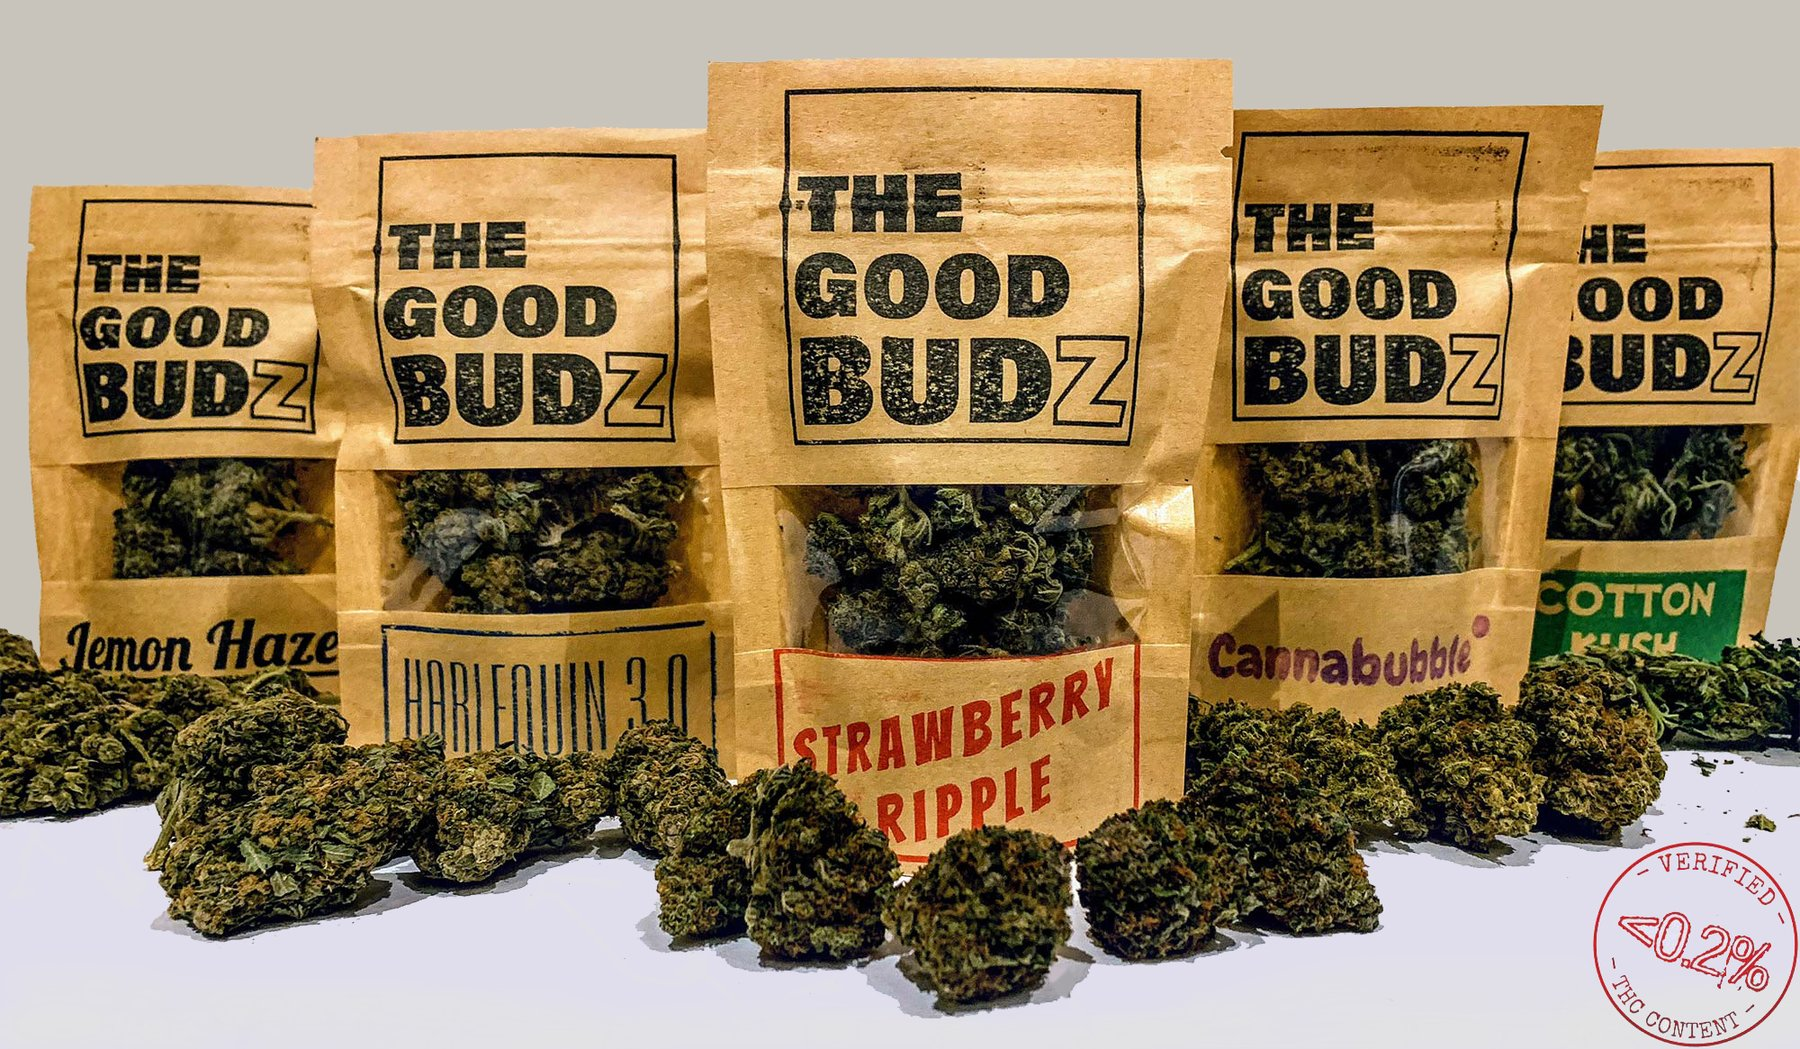 the good budz cbd oil